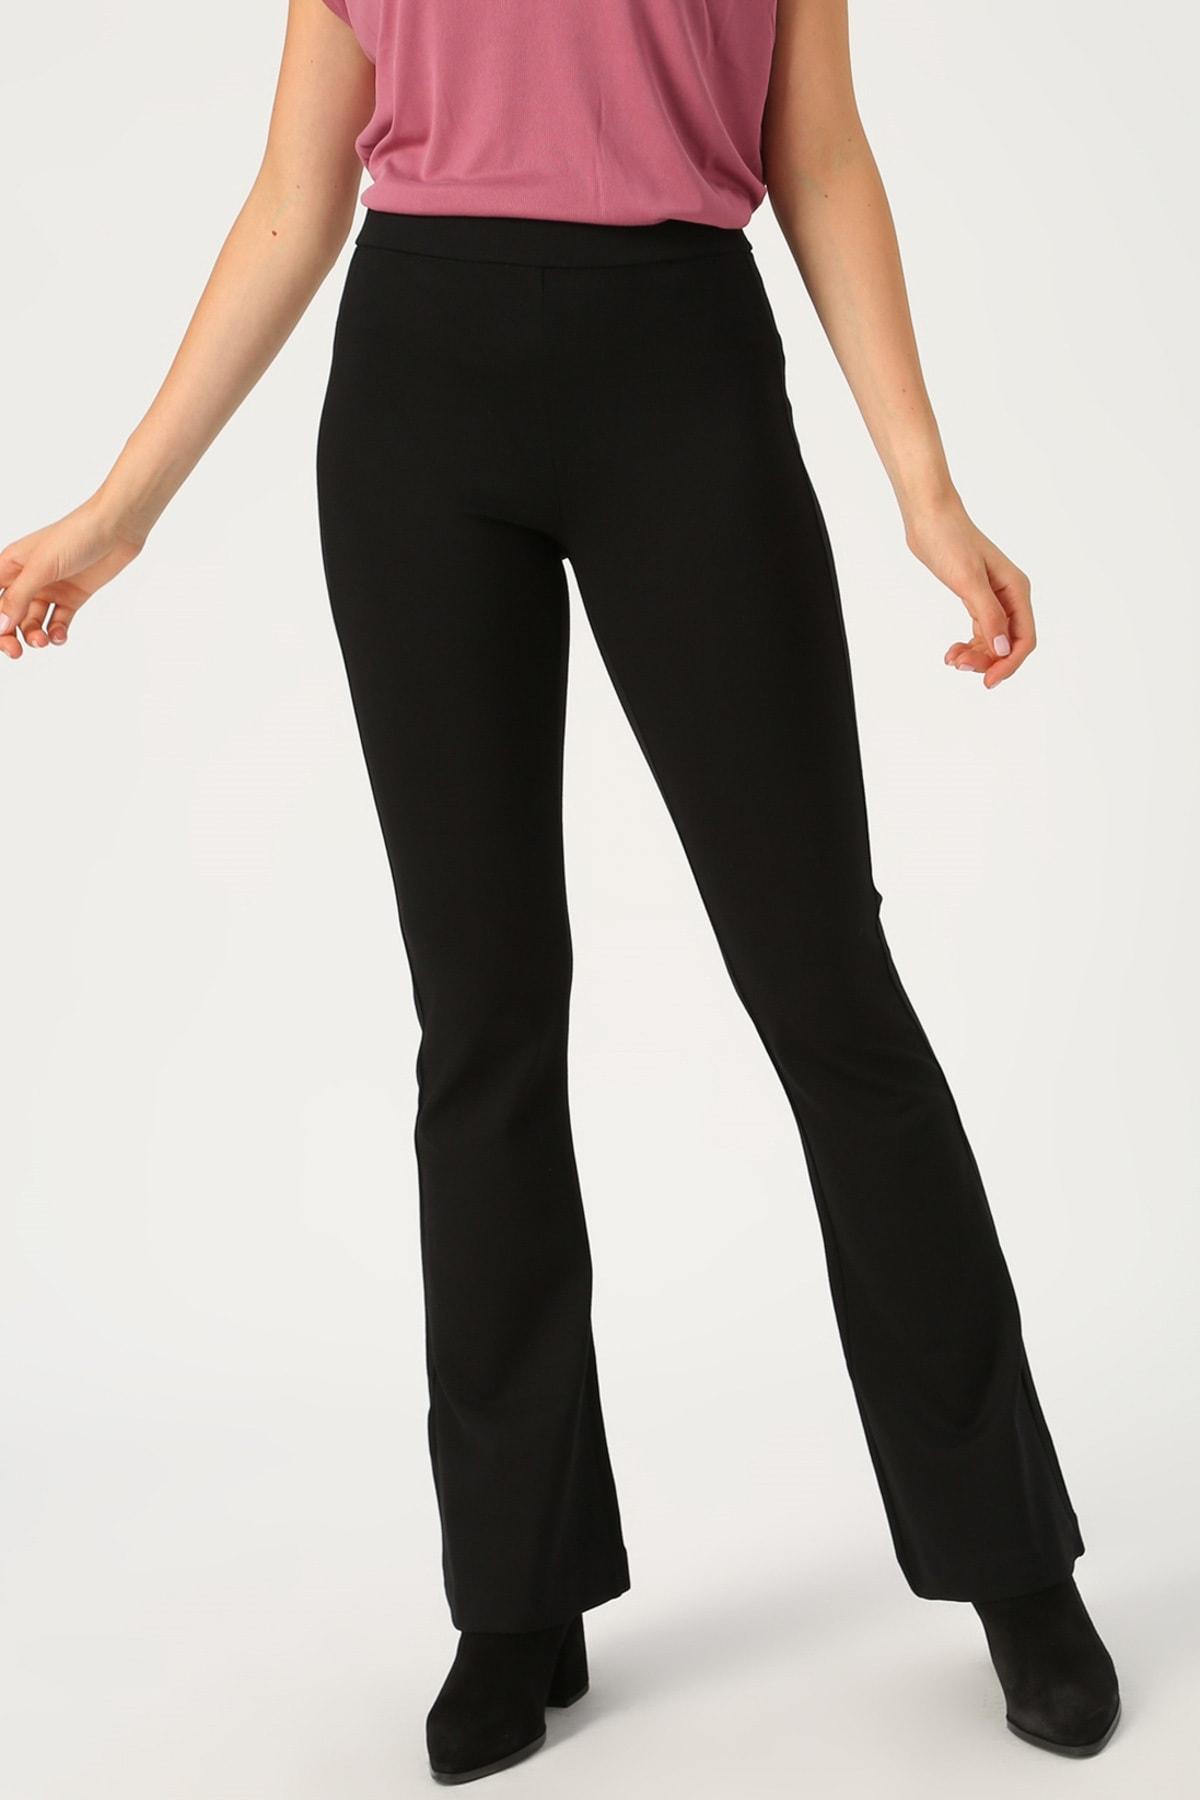 Vero Moda Kadın Siyah Siyah İspanyol Paça Örme Pantolon 10209858 VMKAMMA 2